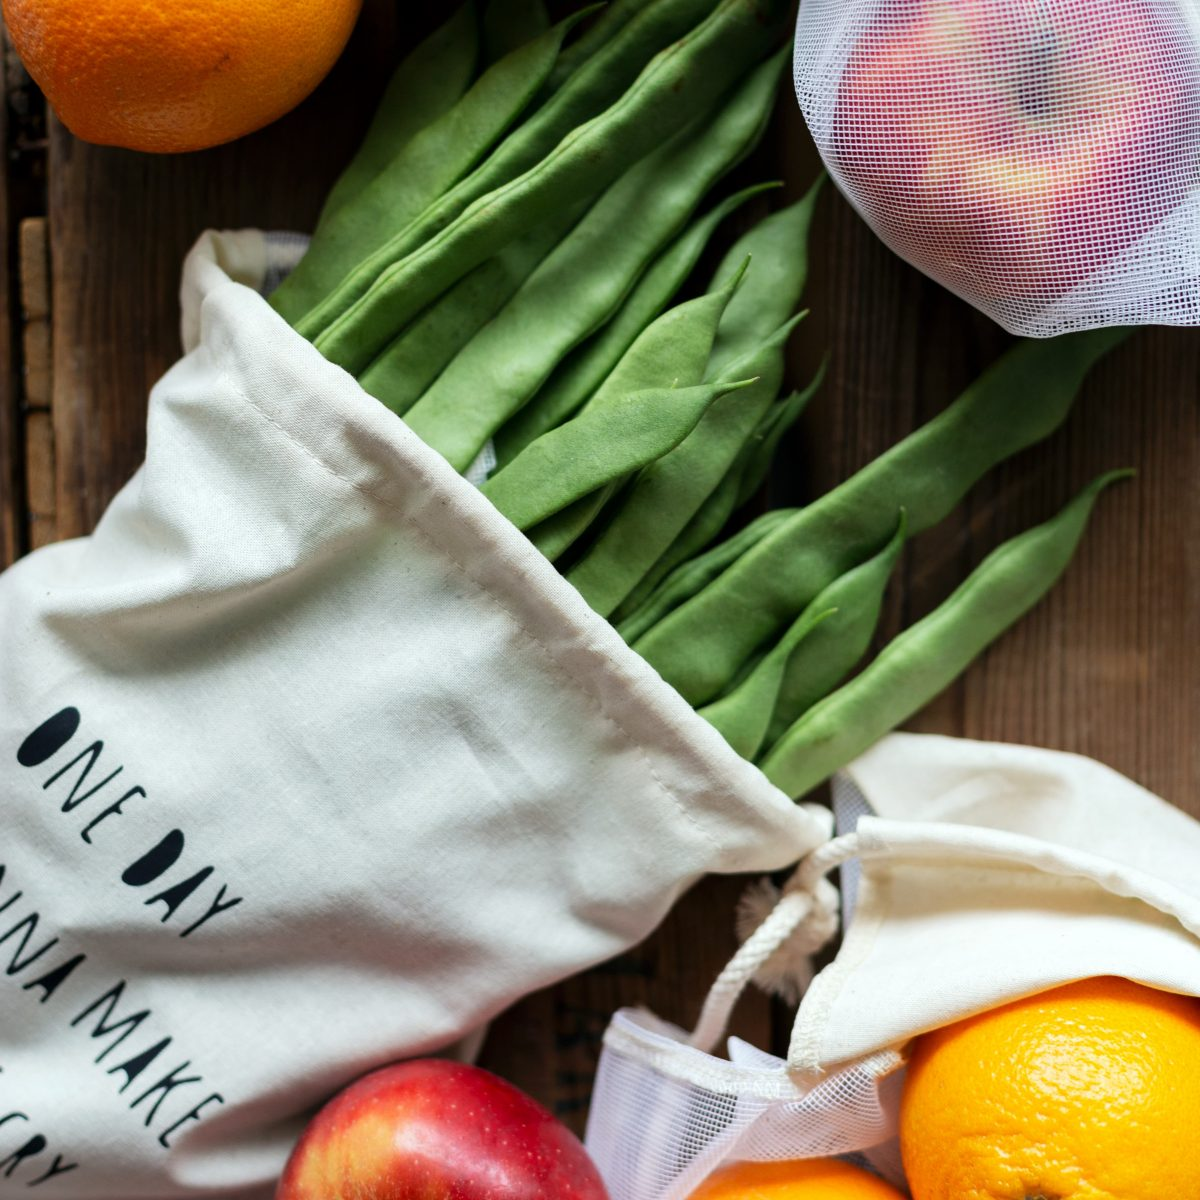 sfeerfoto-van-groente-en-fruitzakje-met-groente-en-fruit-er-omheen